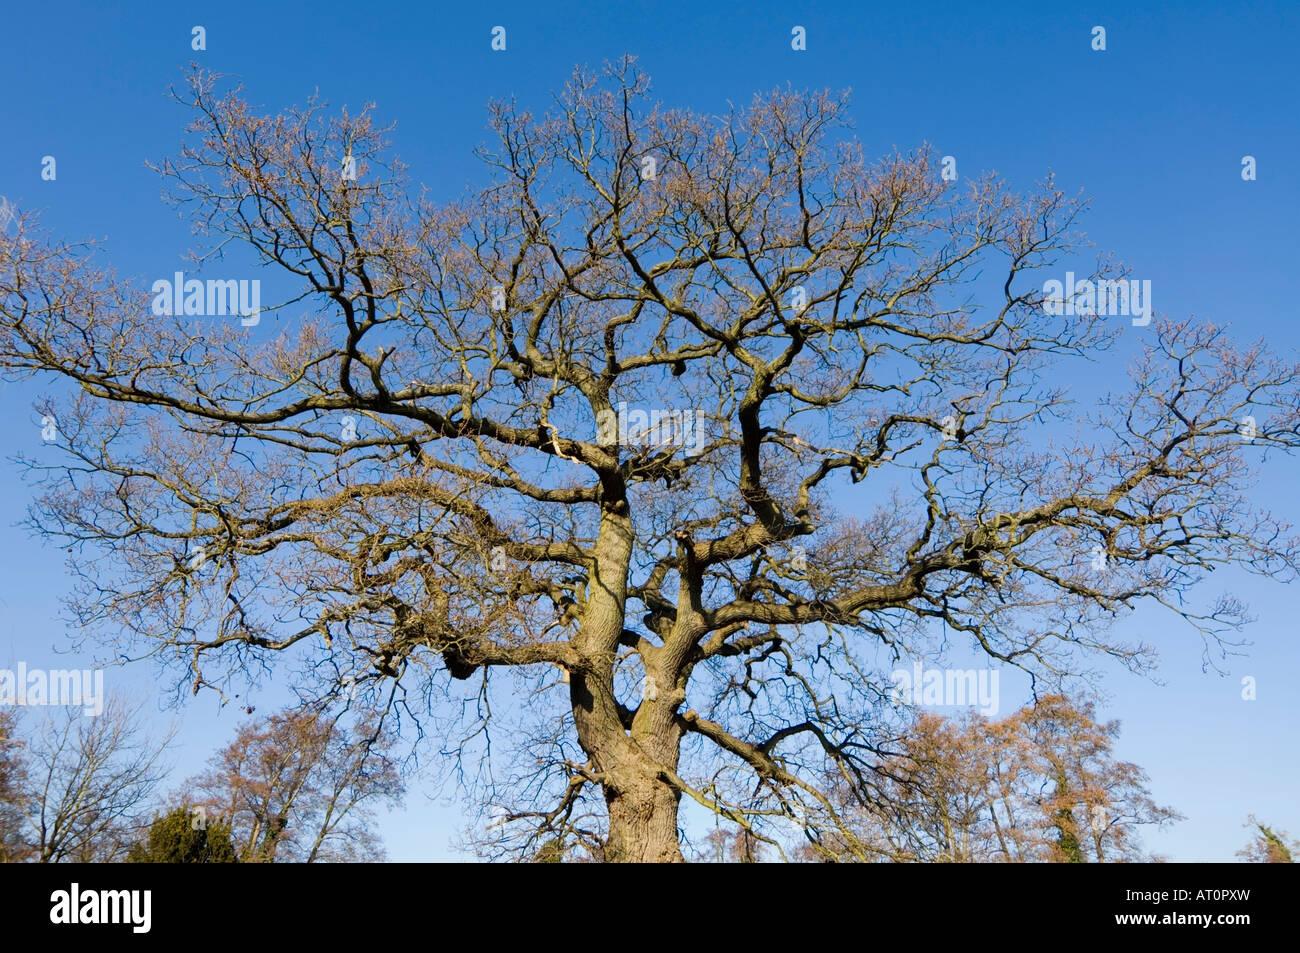 Leafless tree in winter Surrey UK - Stock Image